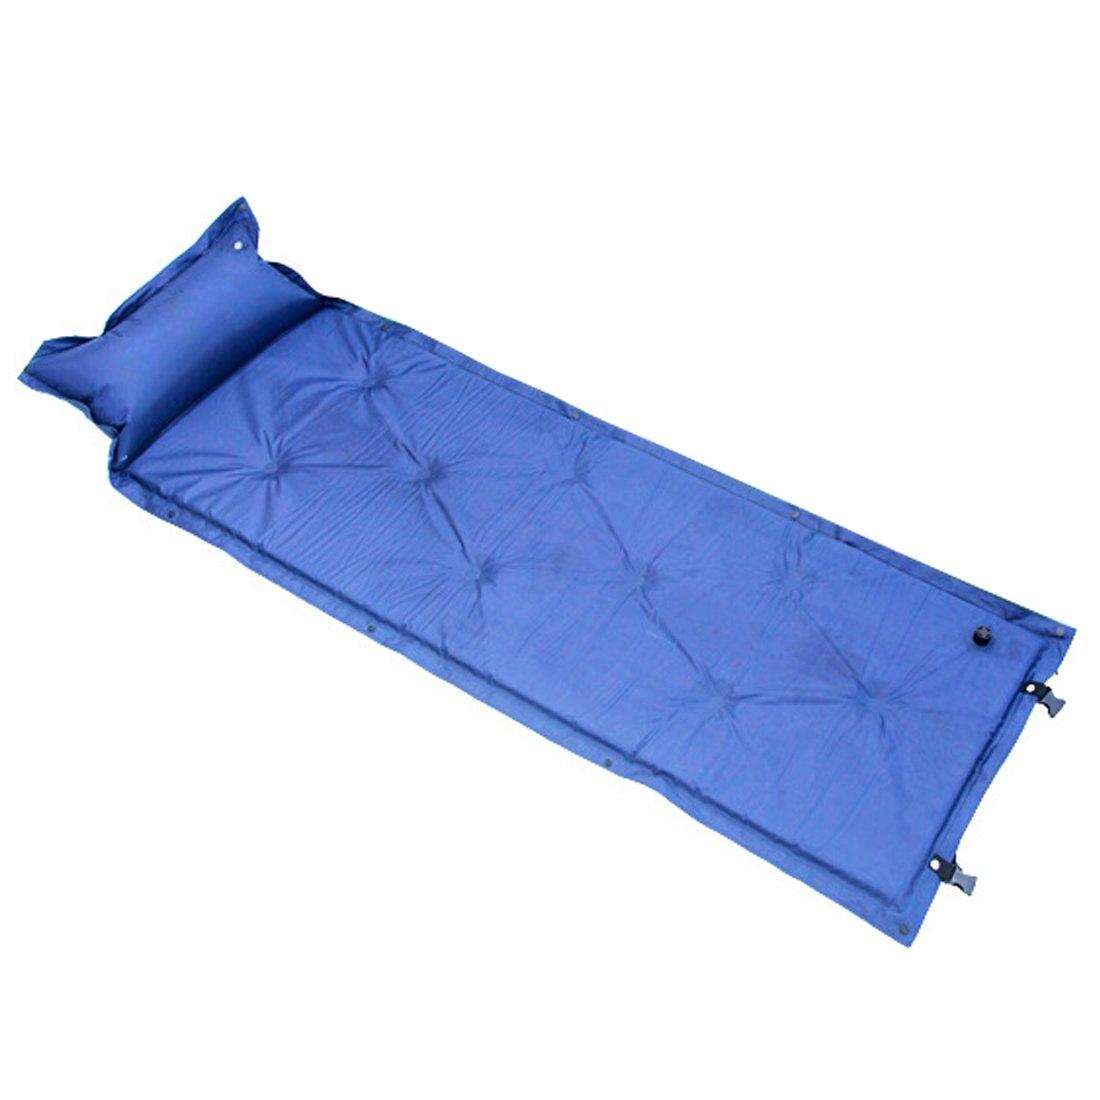 Ultralight Self Inflating Camping Sleeping Pad Airマットレスベッドwith膨らませの枕バックパッキングテントハイキングビーチ旅行by Hi Suyi B07BGXCJB6  ブルー